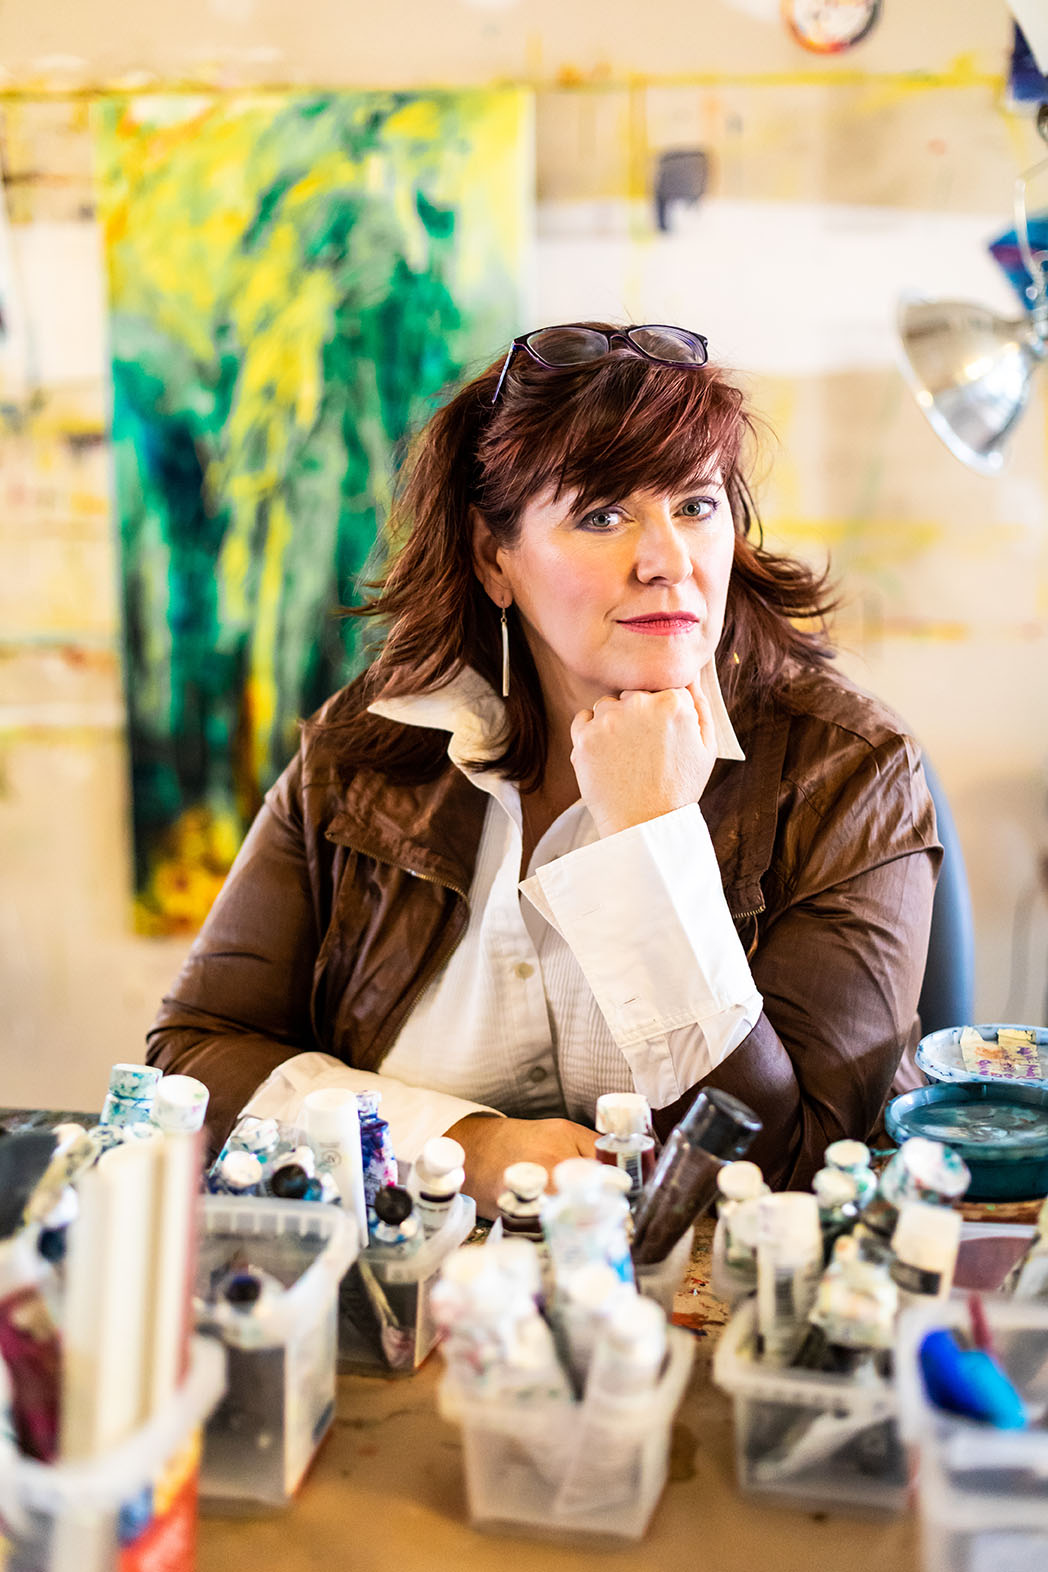 Artisans + Crafters: Dru Pilmer